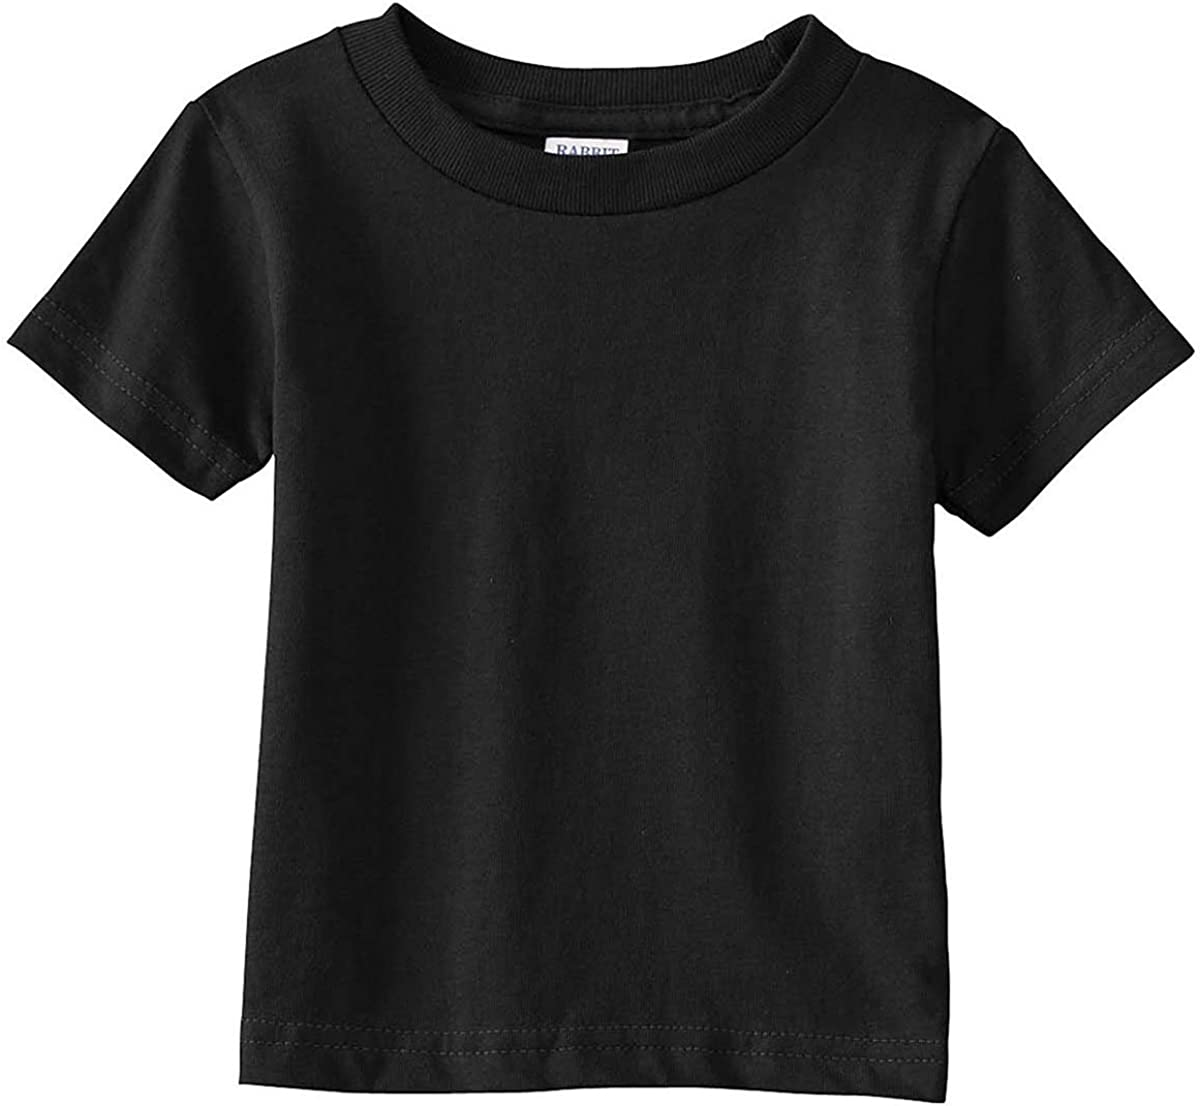 RABBIT SKINS 5.5 oz. Short-Sleeve Jersey T-Shirt (3401)